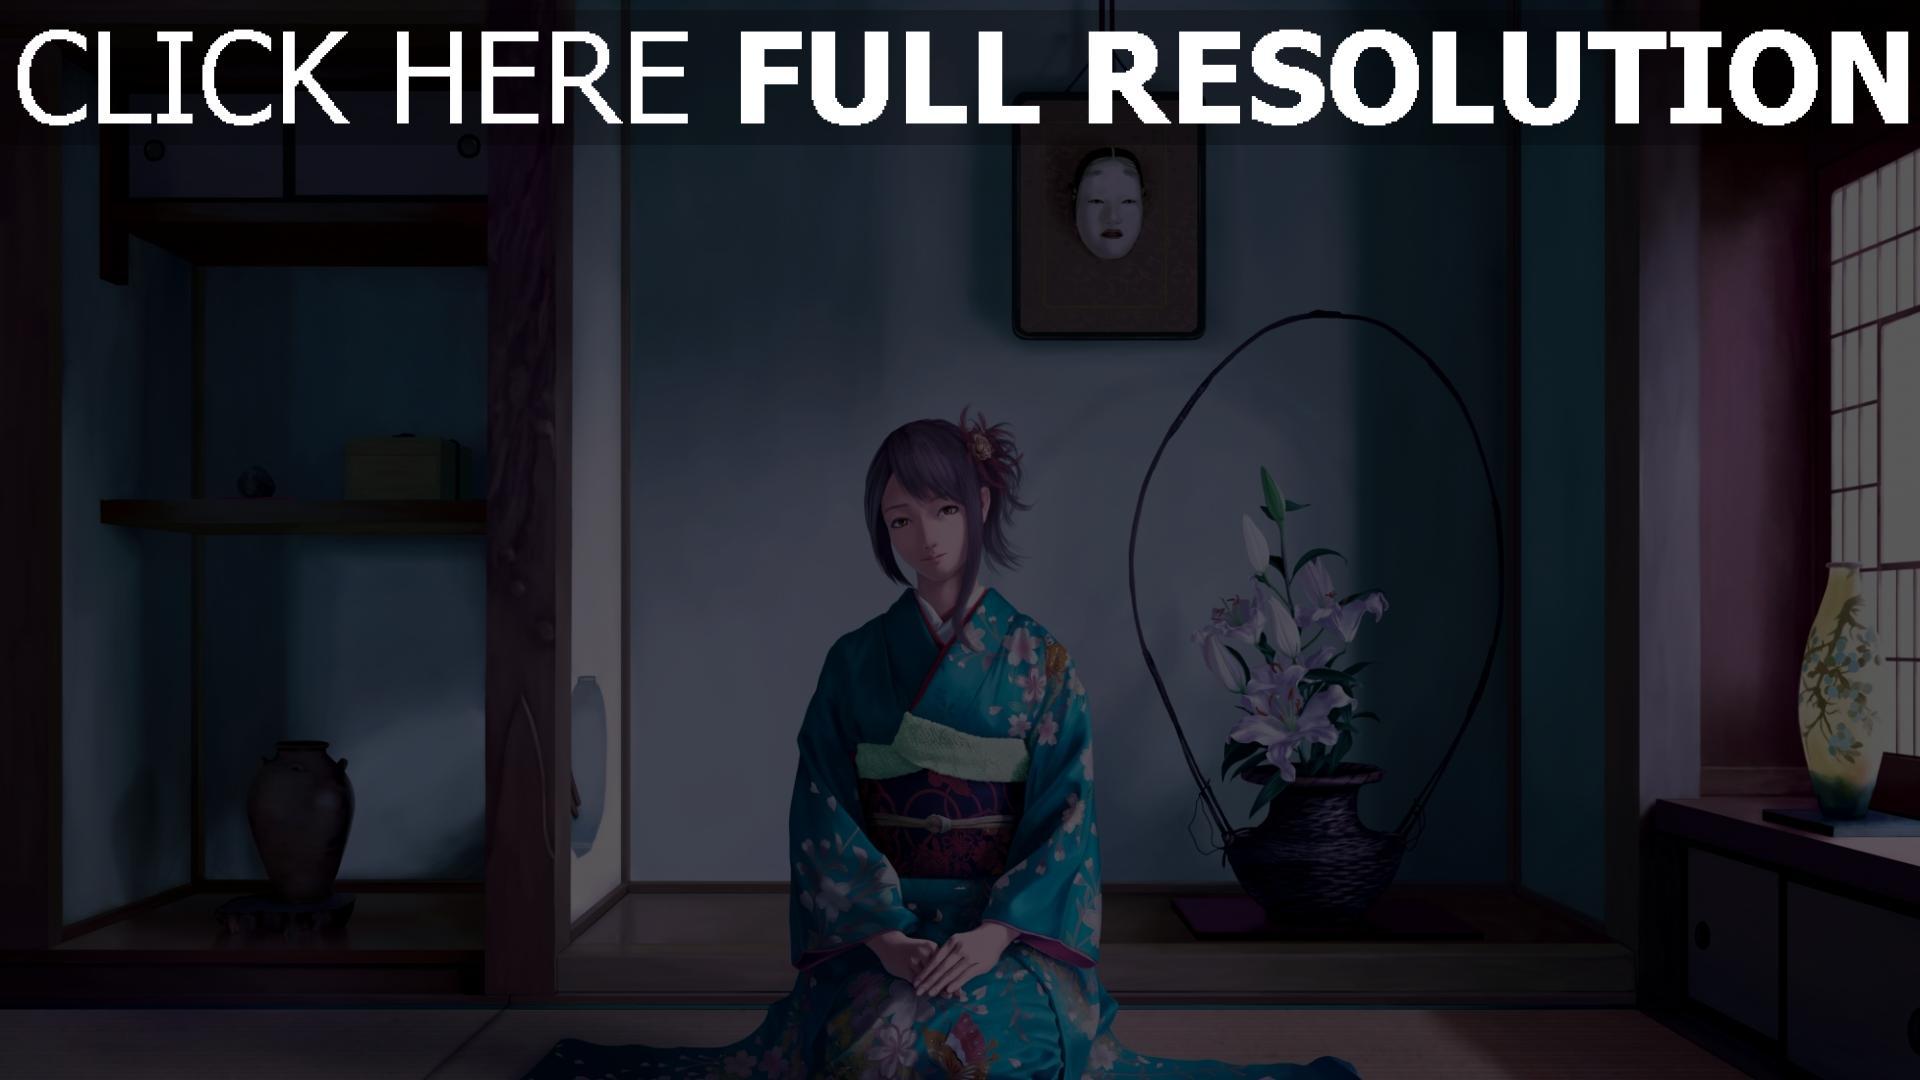 Hd hintergrundbilder m dchen sitzend zimmer kimono l cheln for Home wallpaper japan